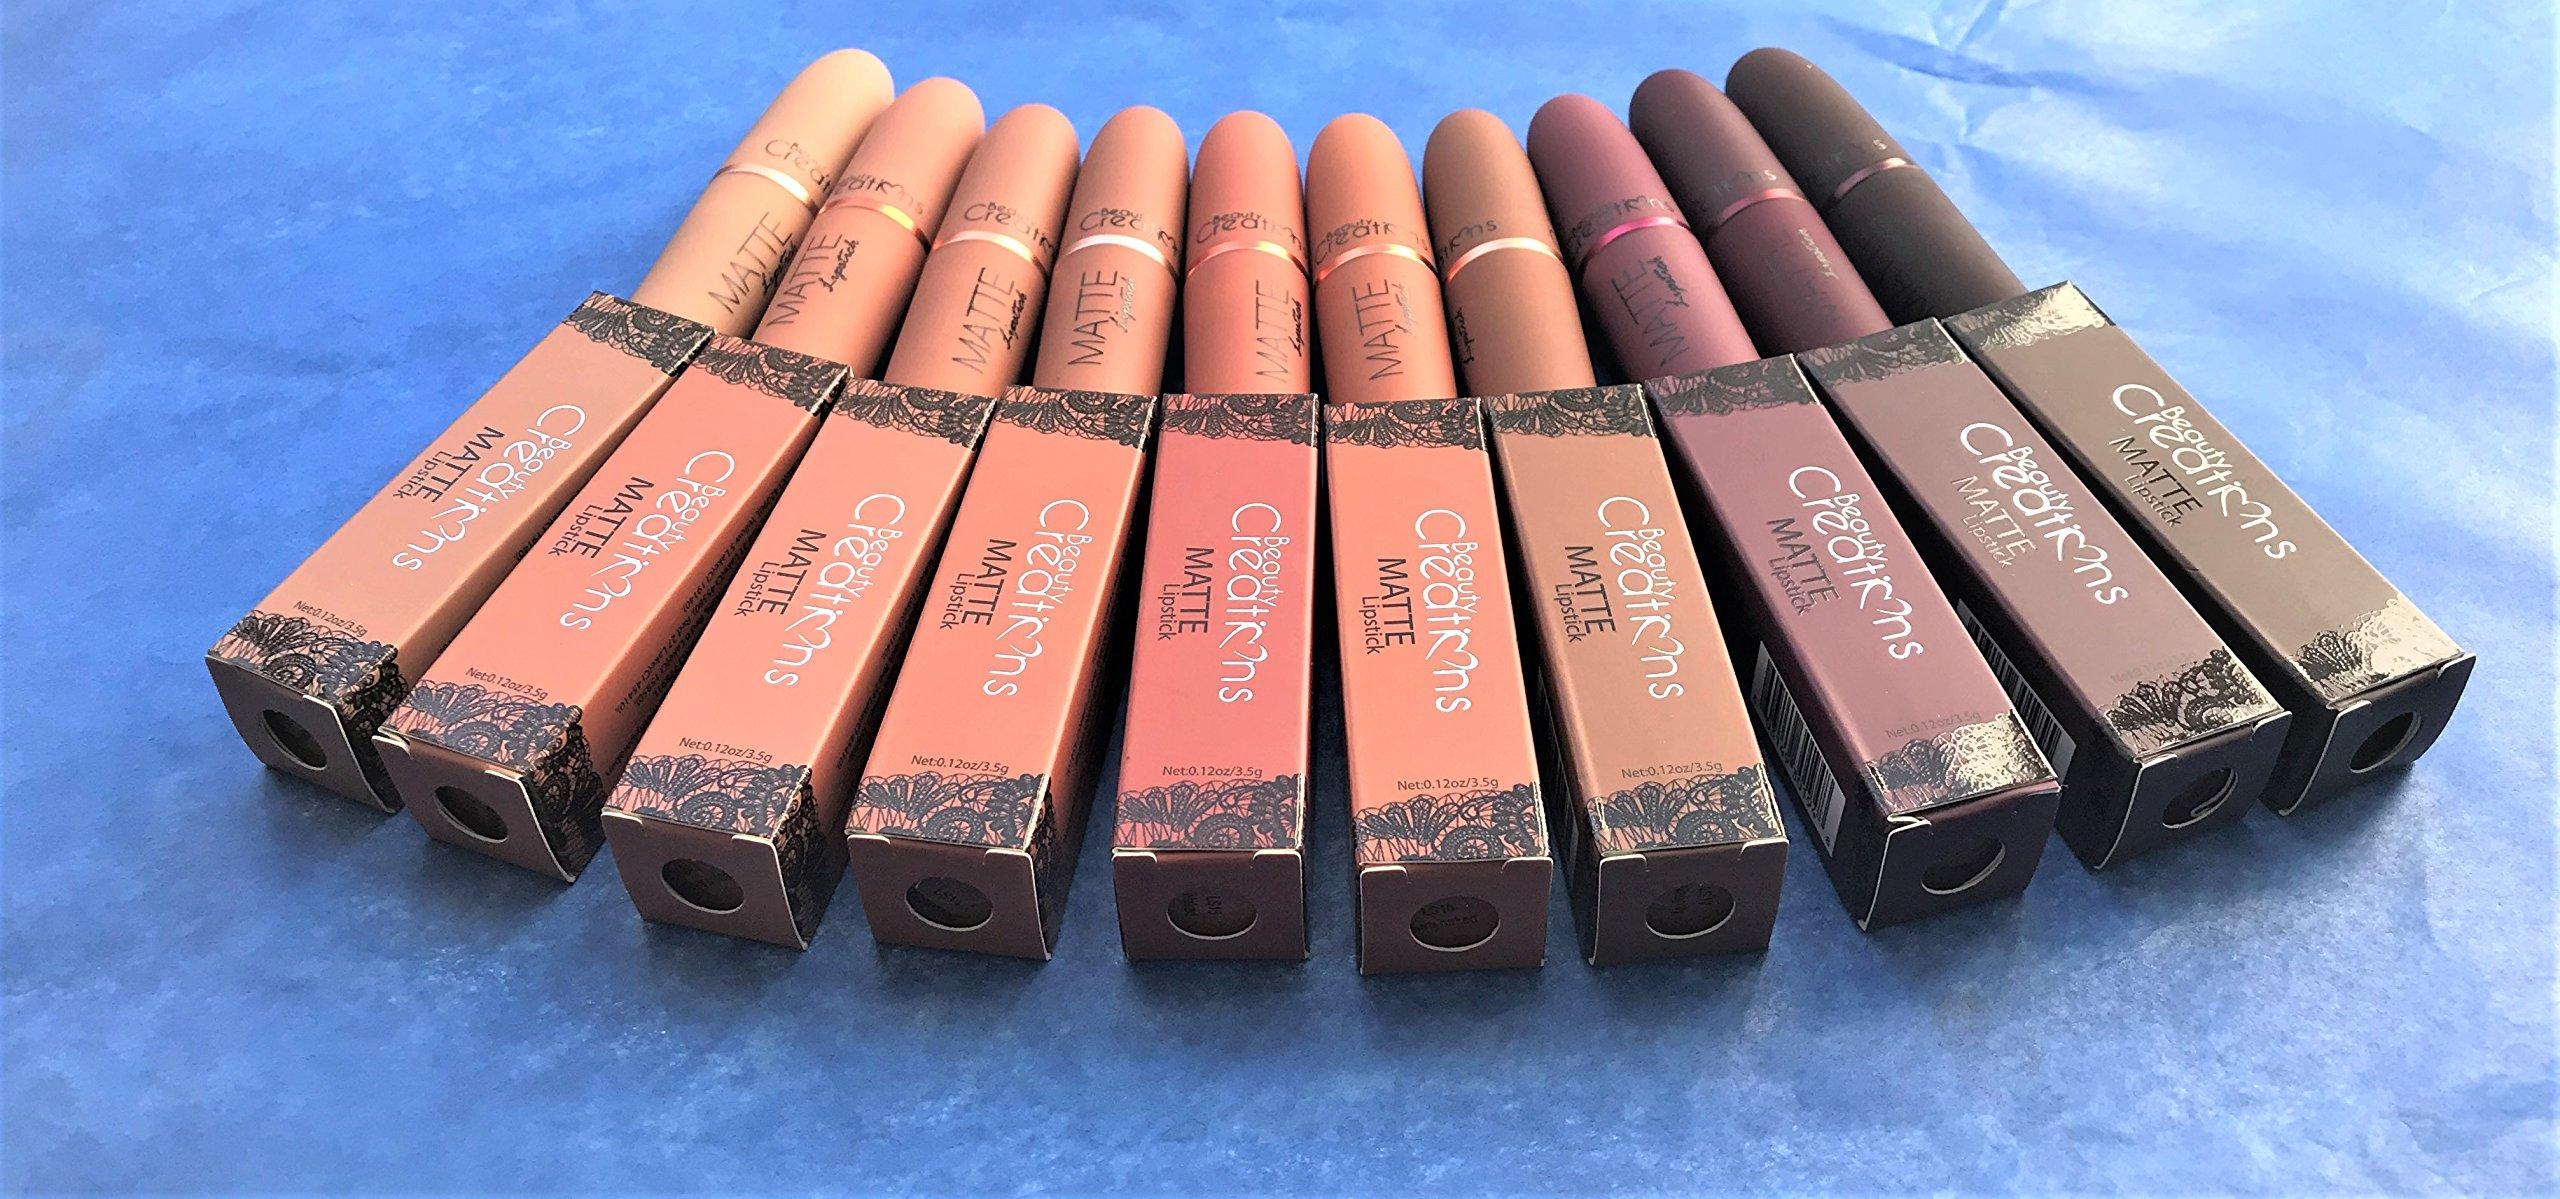 edf7bbb81542 Amazon.com: Beauty Creations Matte Lipstick 10 Pcs Set LS01-LS10: Beauty